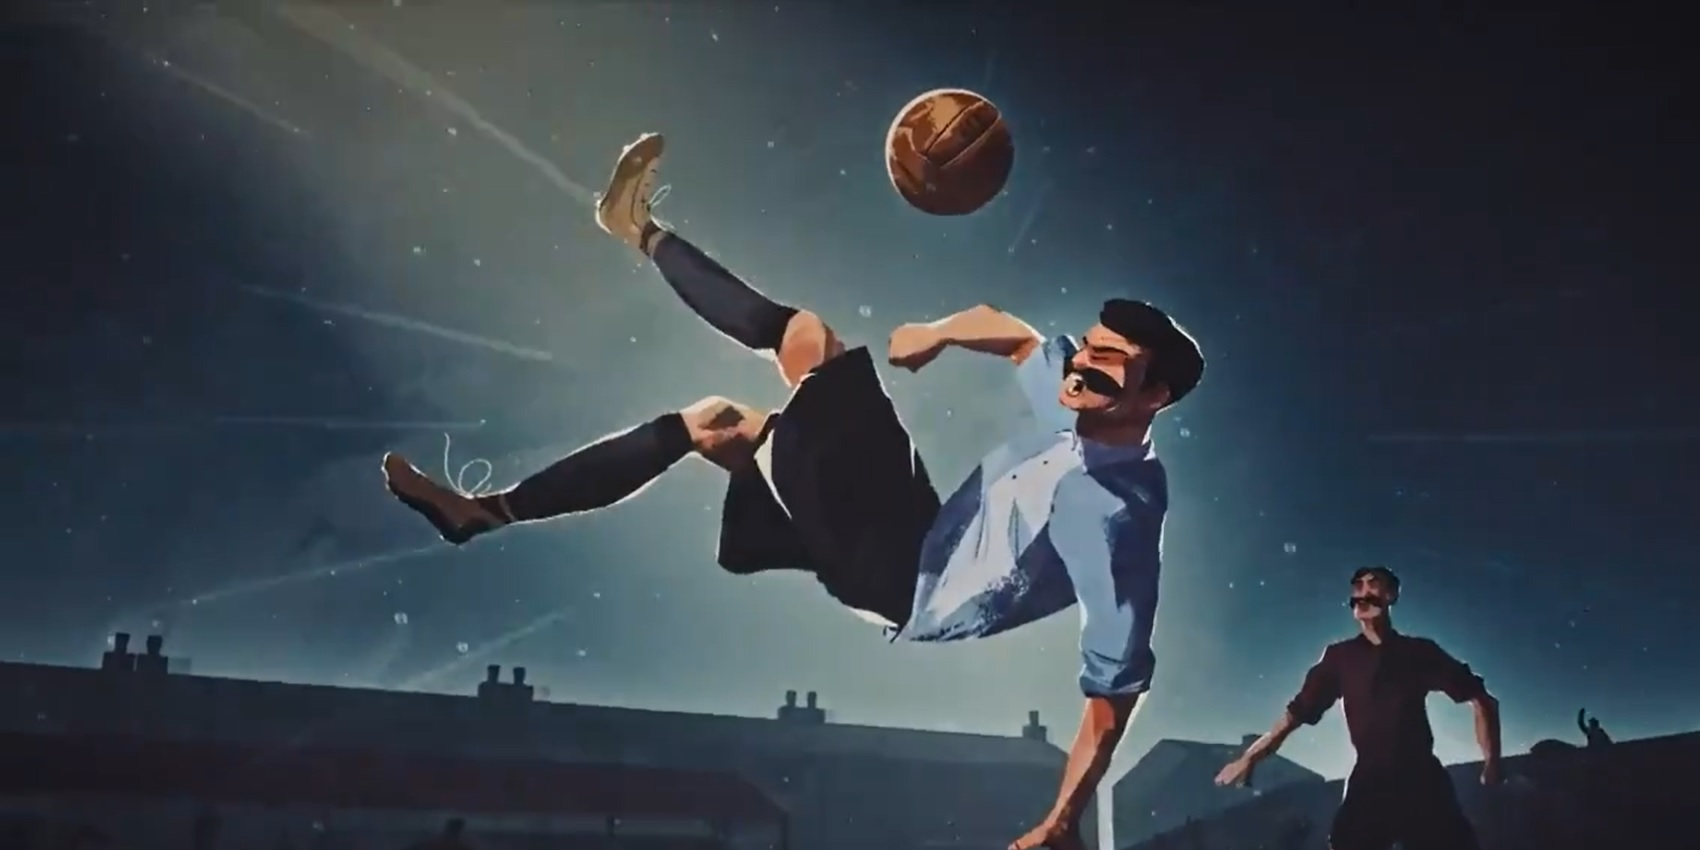 (Video) Liverpool release brilliant cinematic clip to celebrate first club game in 1892